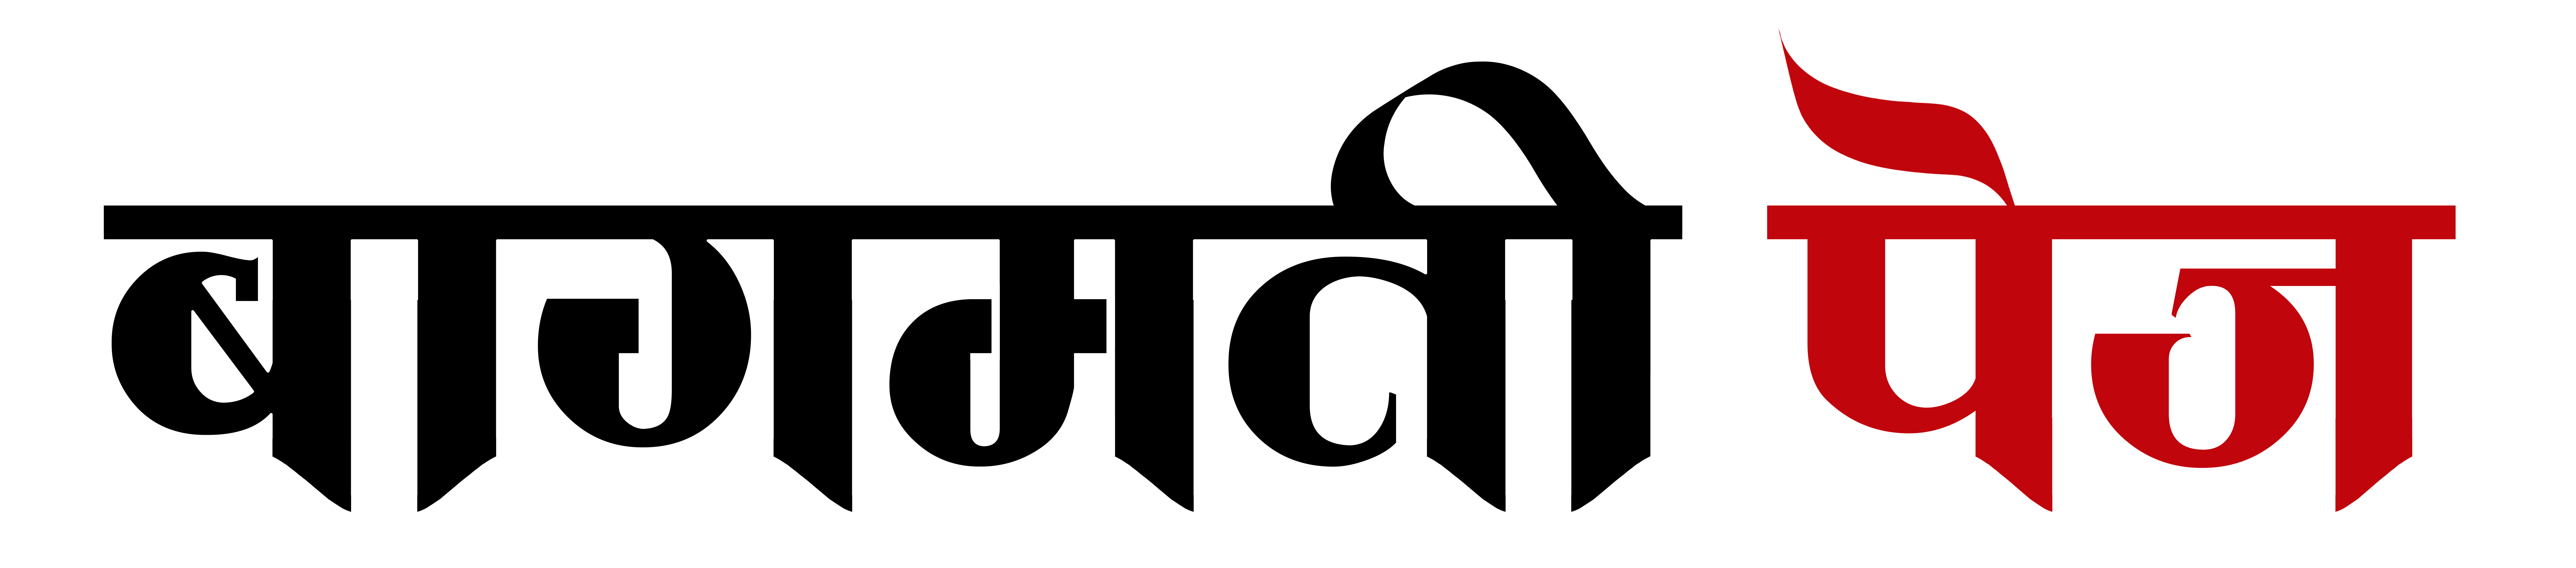 bagmati-page Header logo